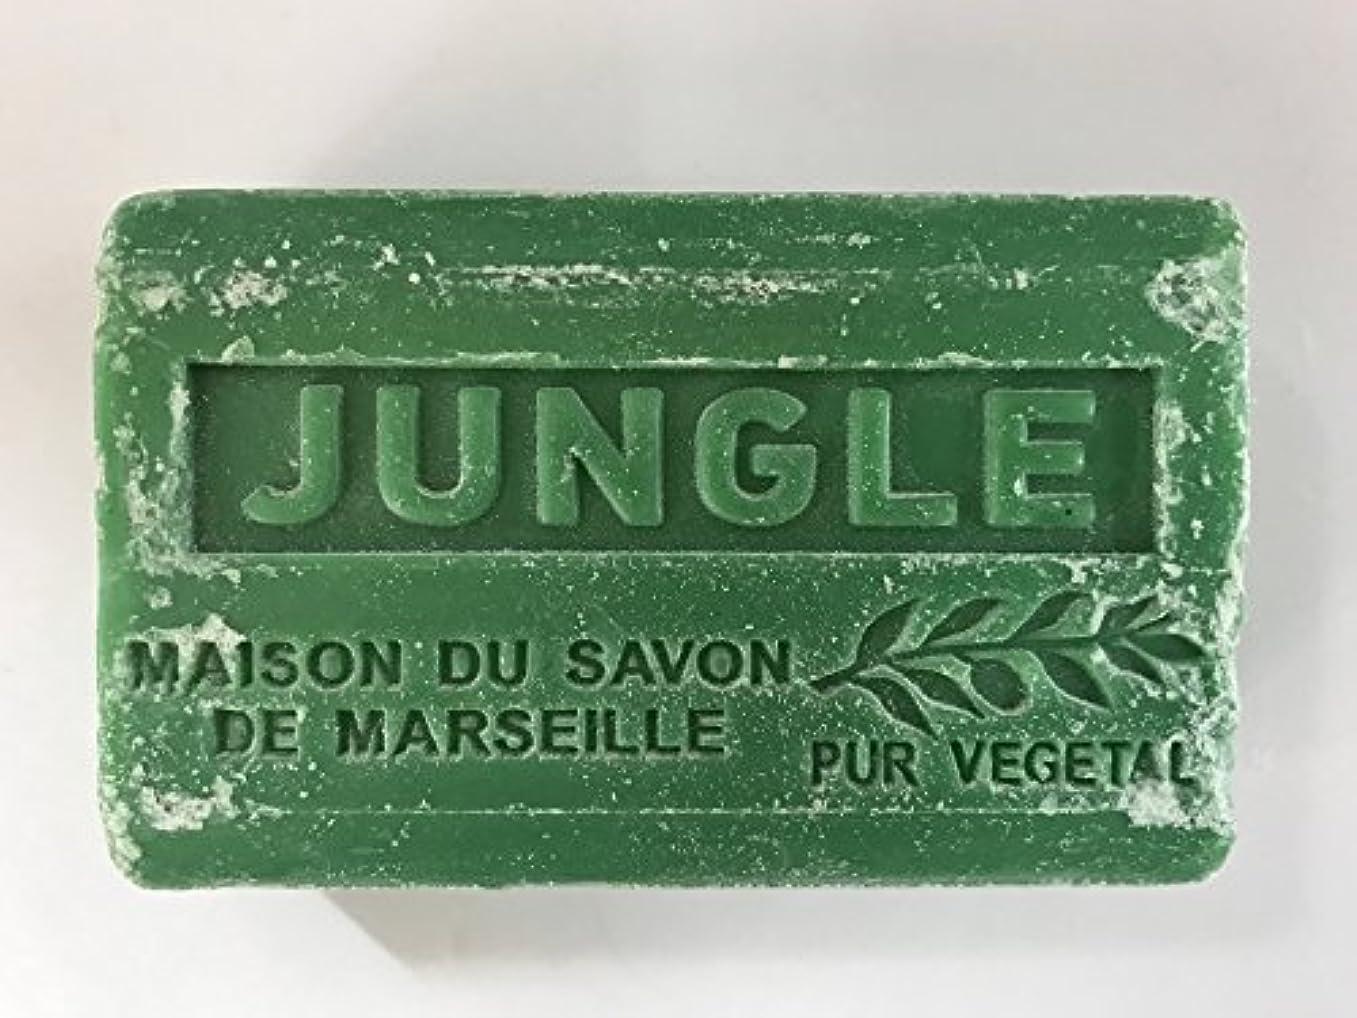 原稿特権的約Savon de Marseille Soap Jungle Shea Butter 125g